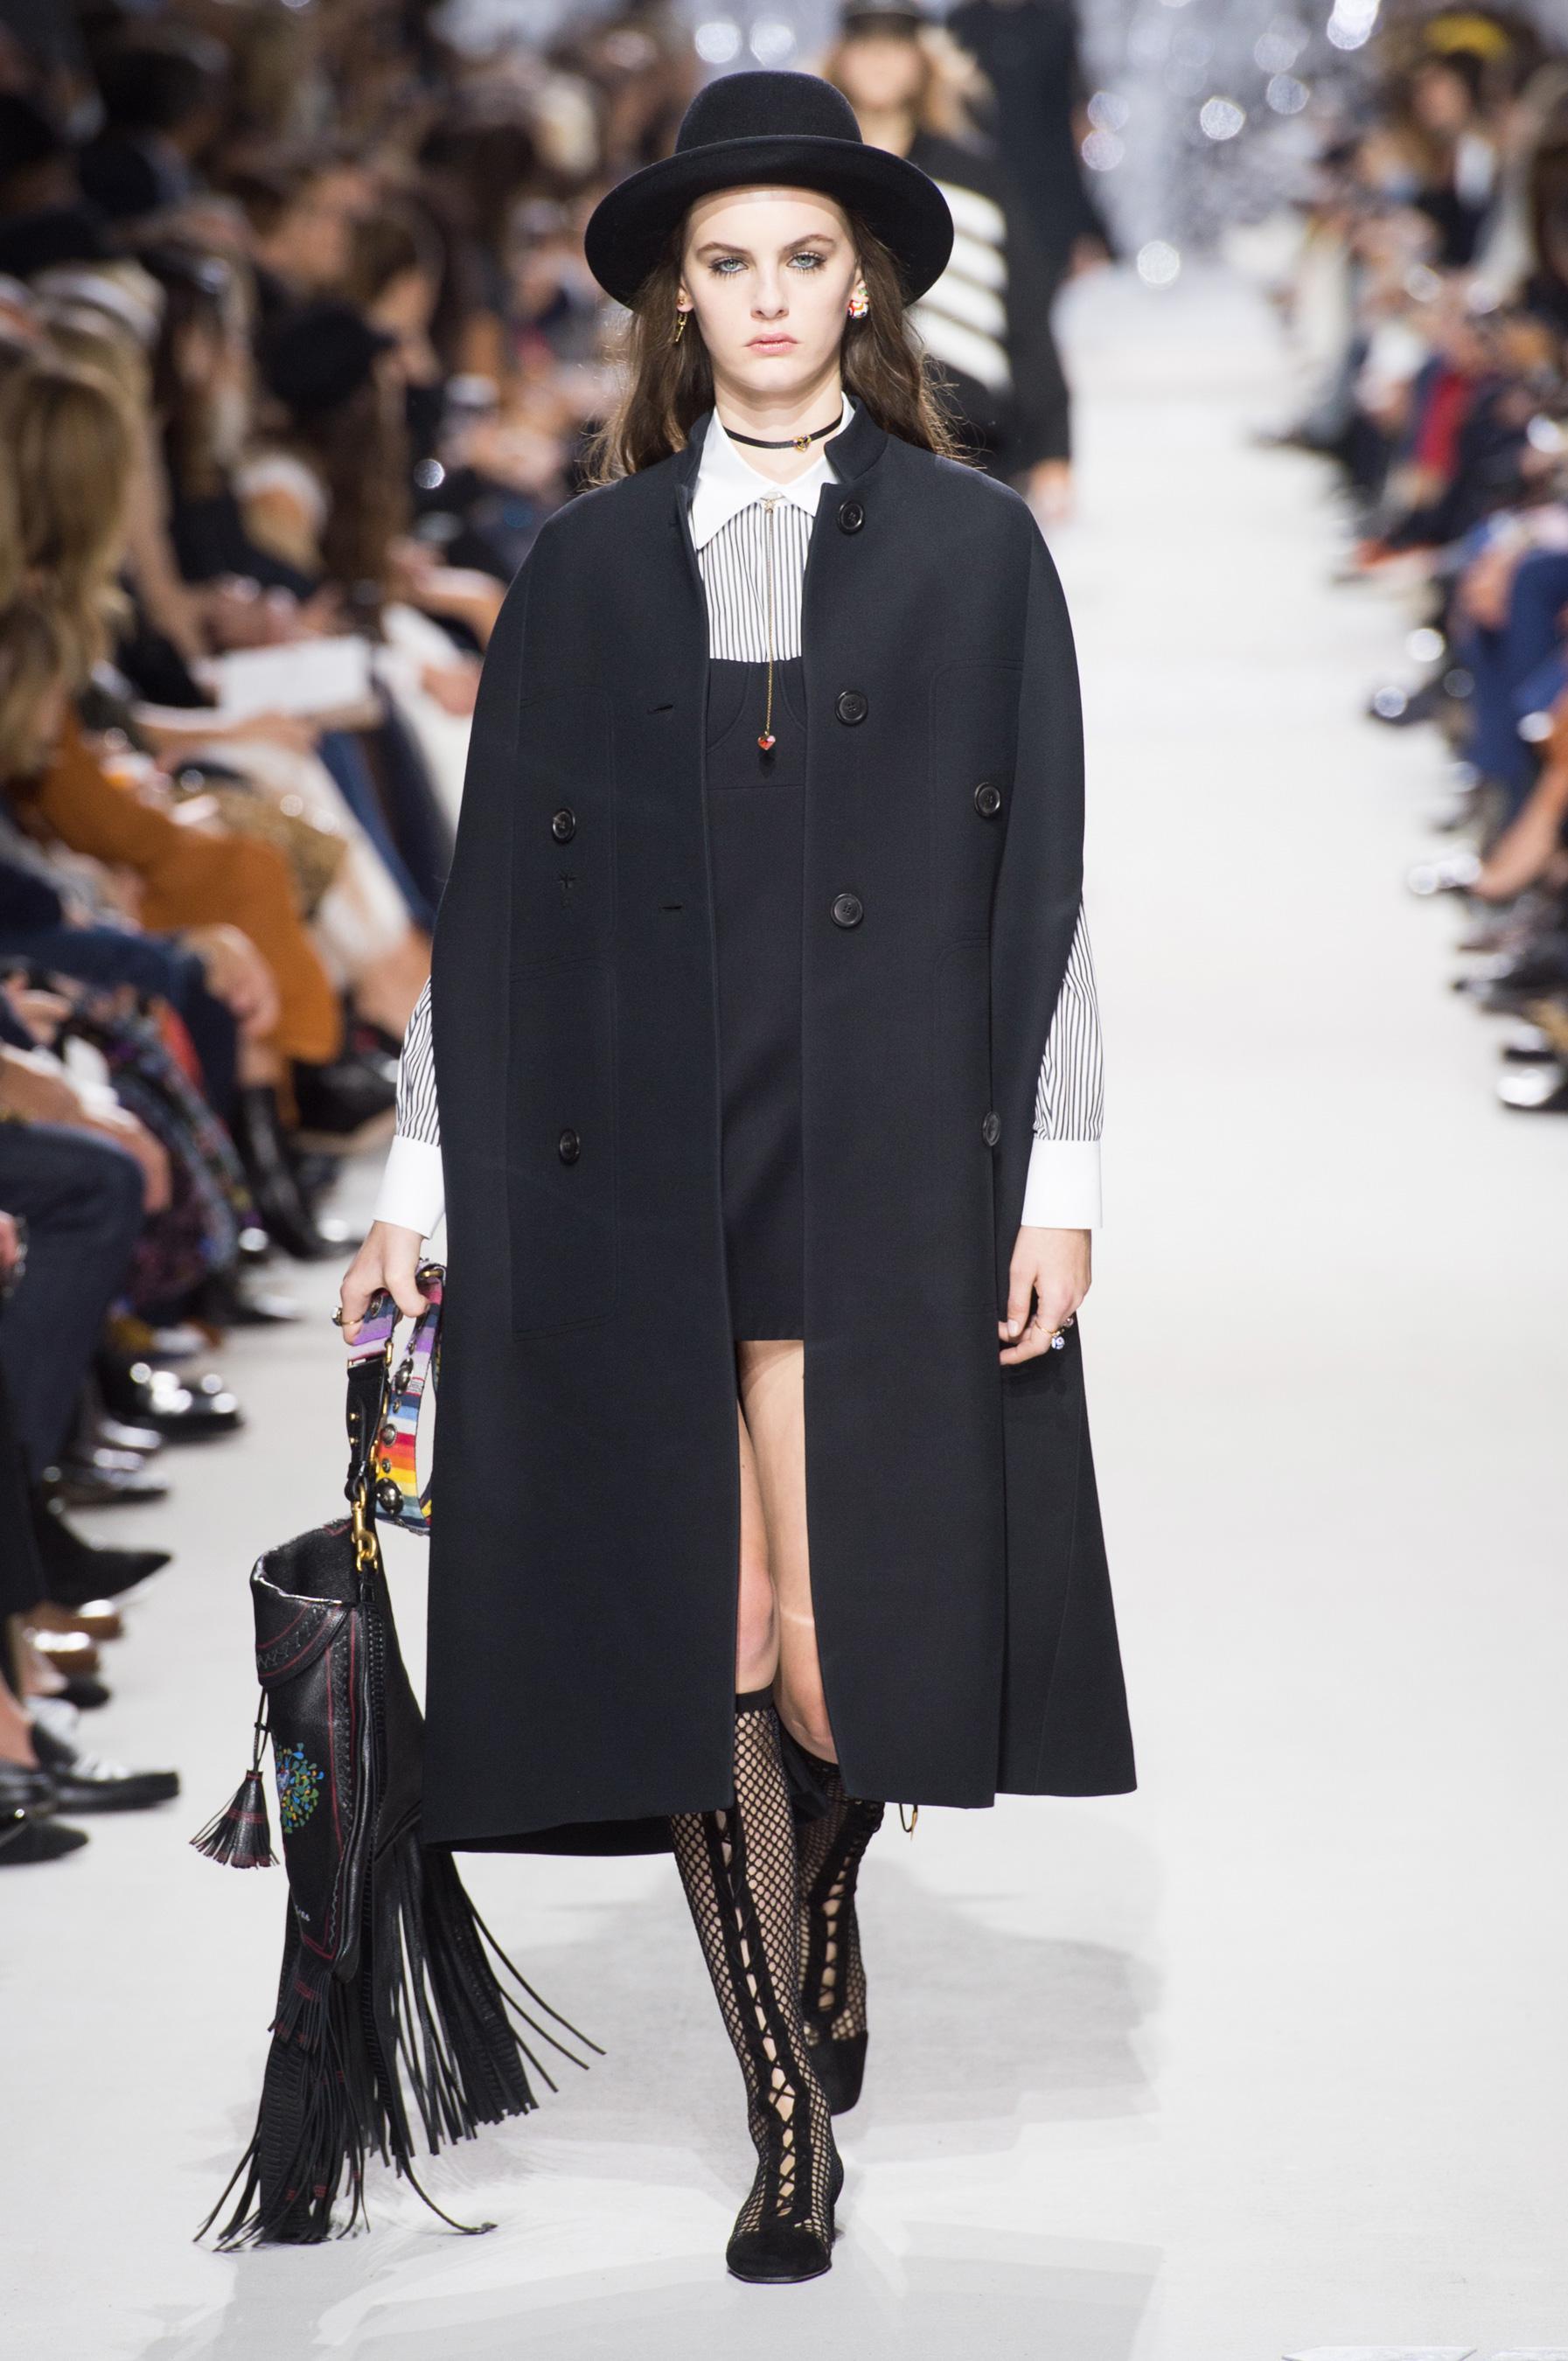 Christian Dior весна лето 2018 пальто